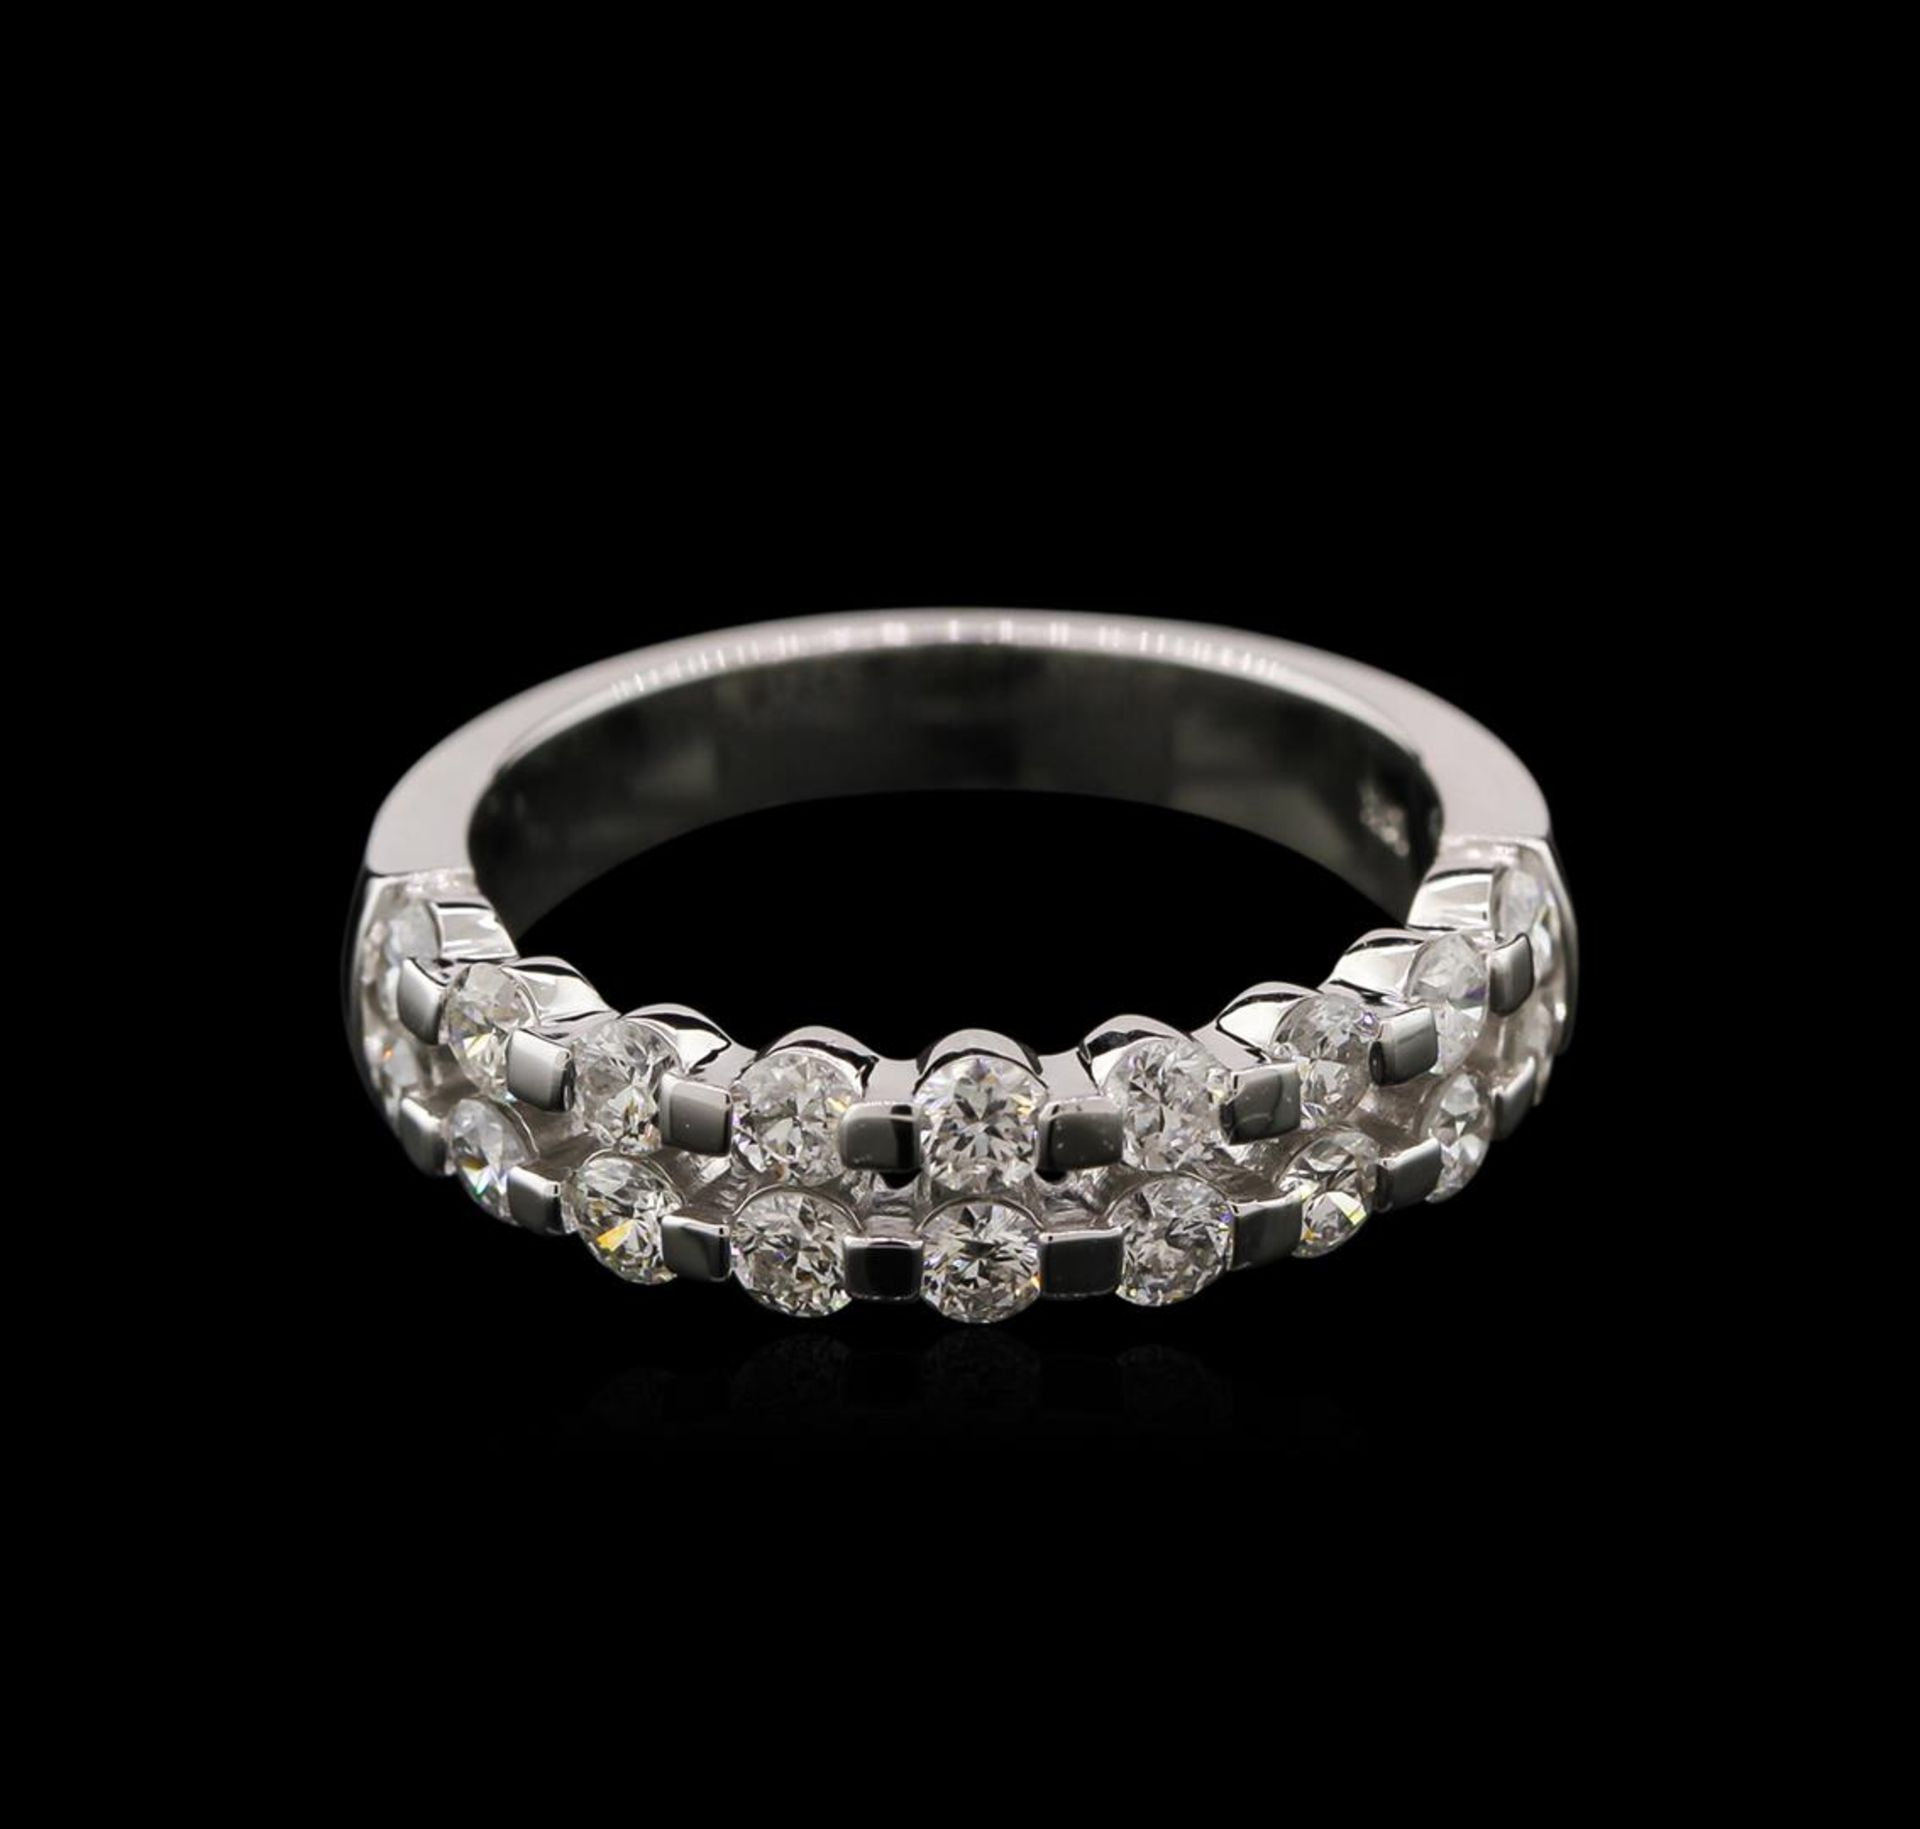 1.05ctw Diamond Ring - 14KT White Gold - Image 2 of 2